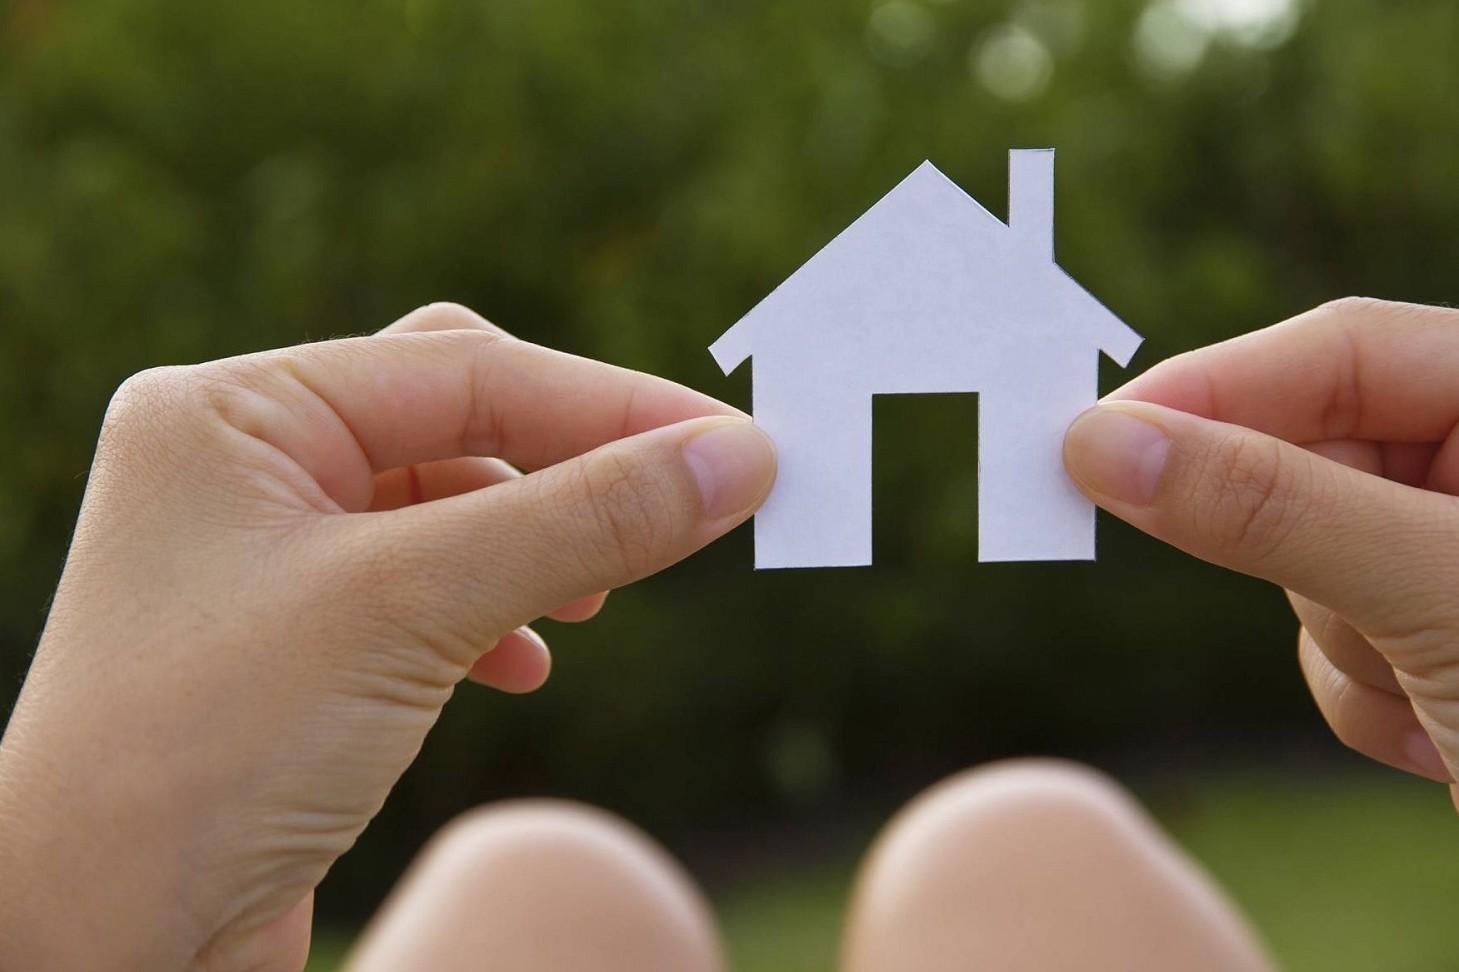 Mutui gratis a determinate condizioni de